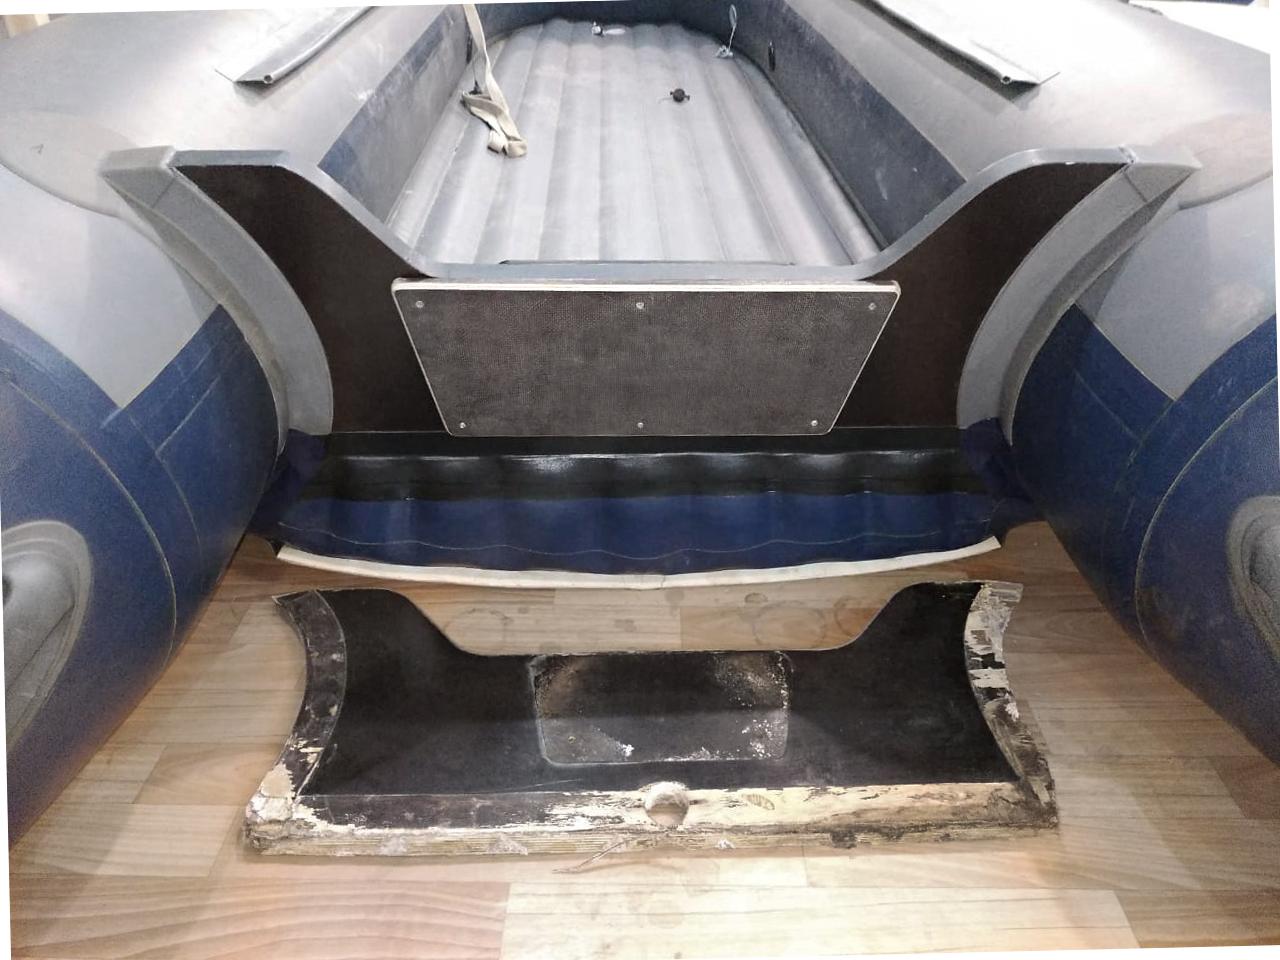 Замена транца на моторной лодке